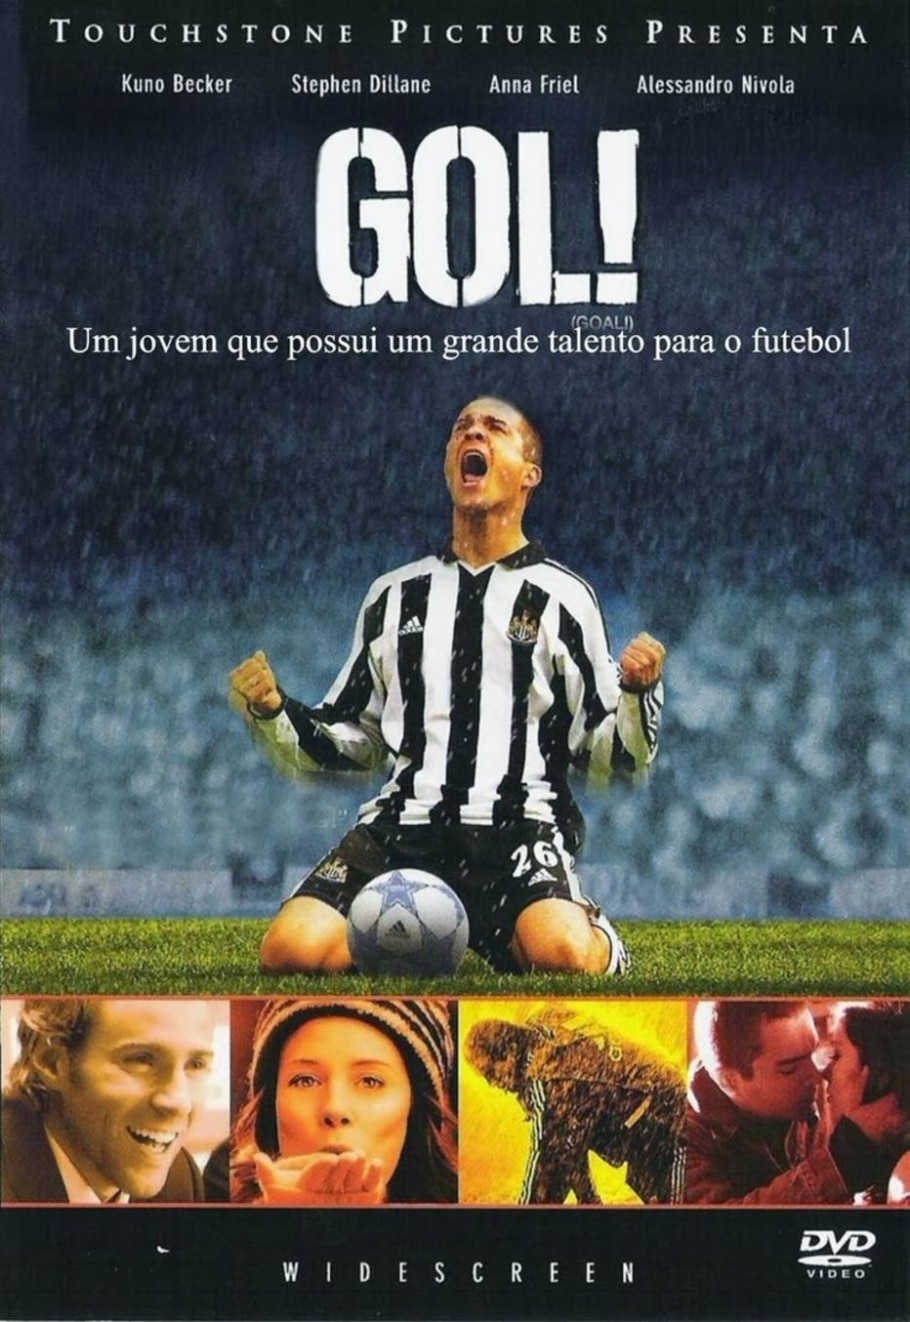 'Gol! – O Sonho Impossível' (2005) - TOUCHSTONE PICTURES